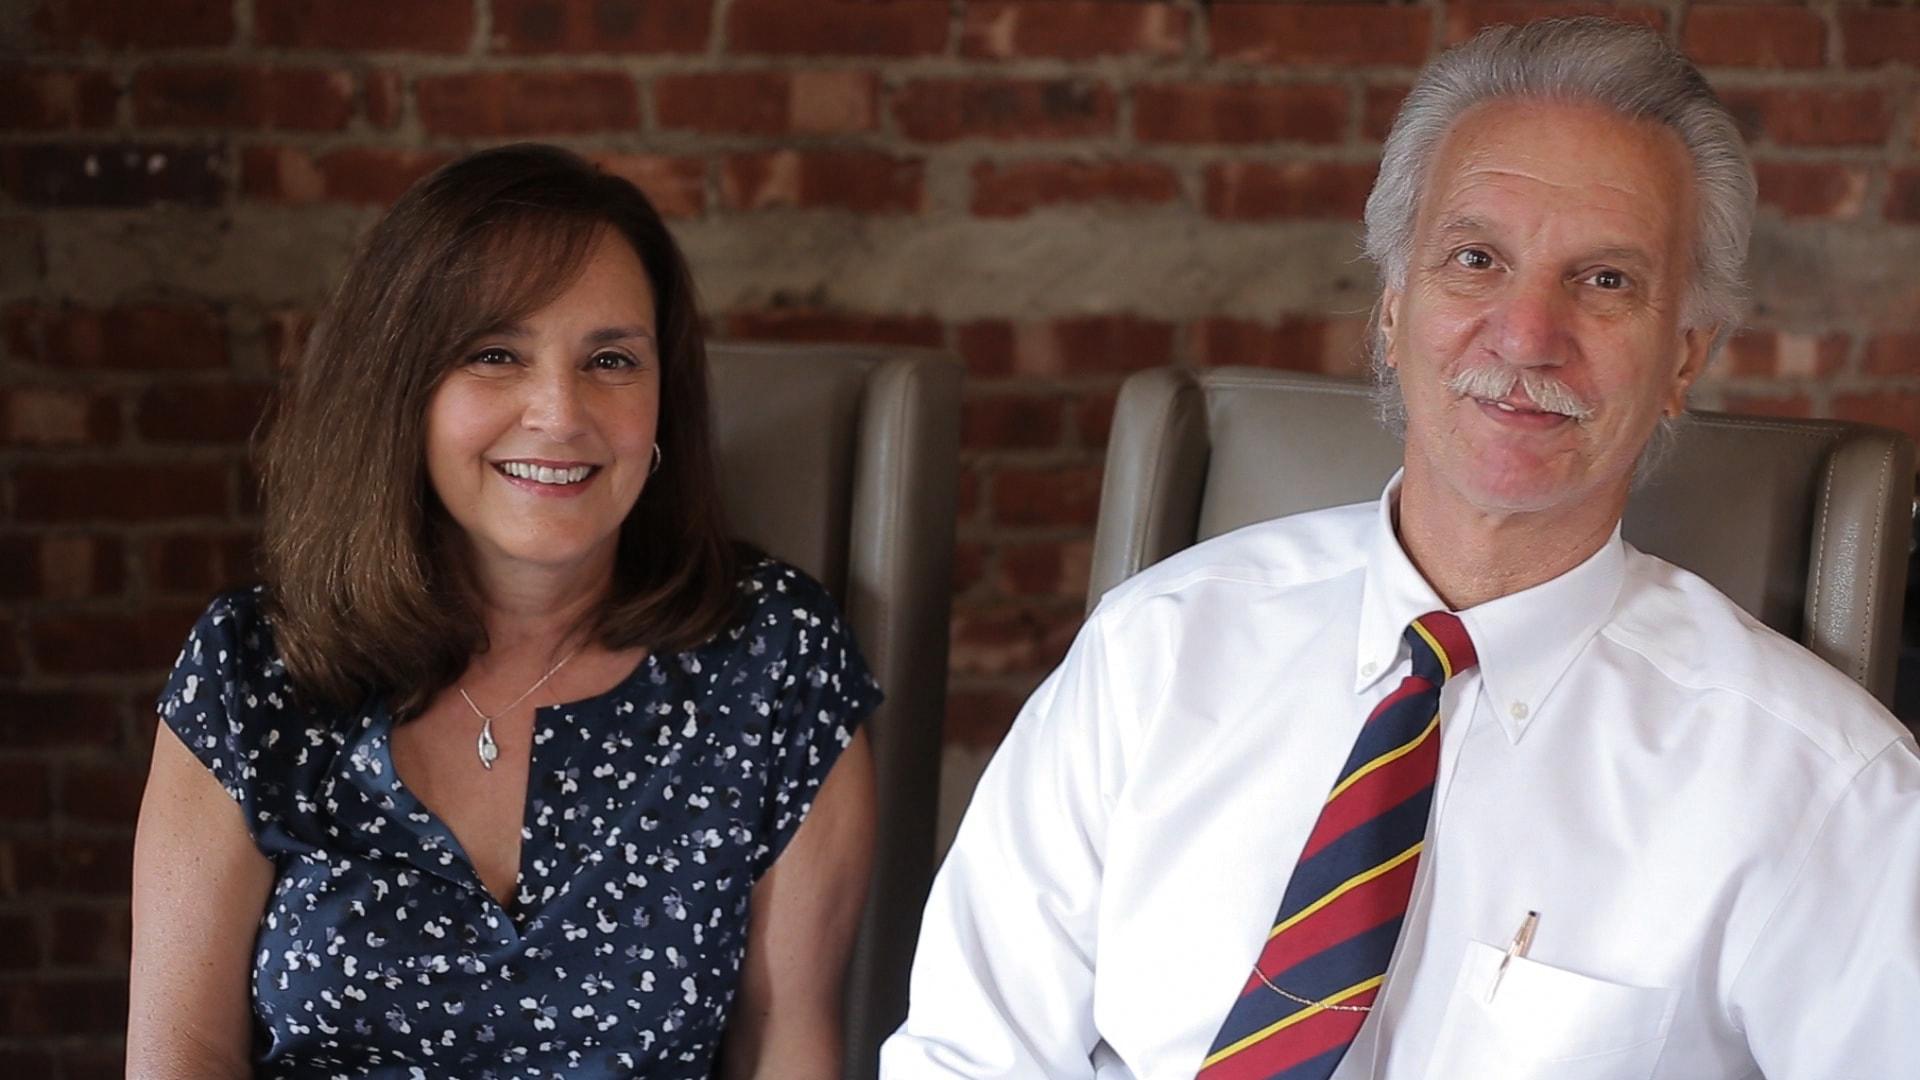 Gary Kolesaire and Barbara Kolesaire of Davidoff Lounge in The Tobacco Shop of Ridgewood-min.jpg